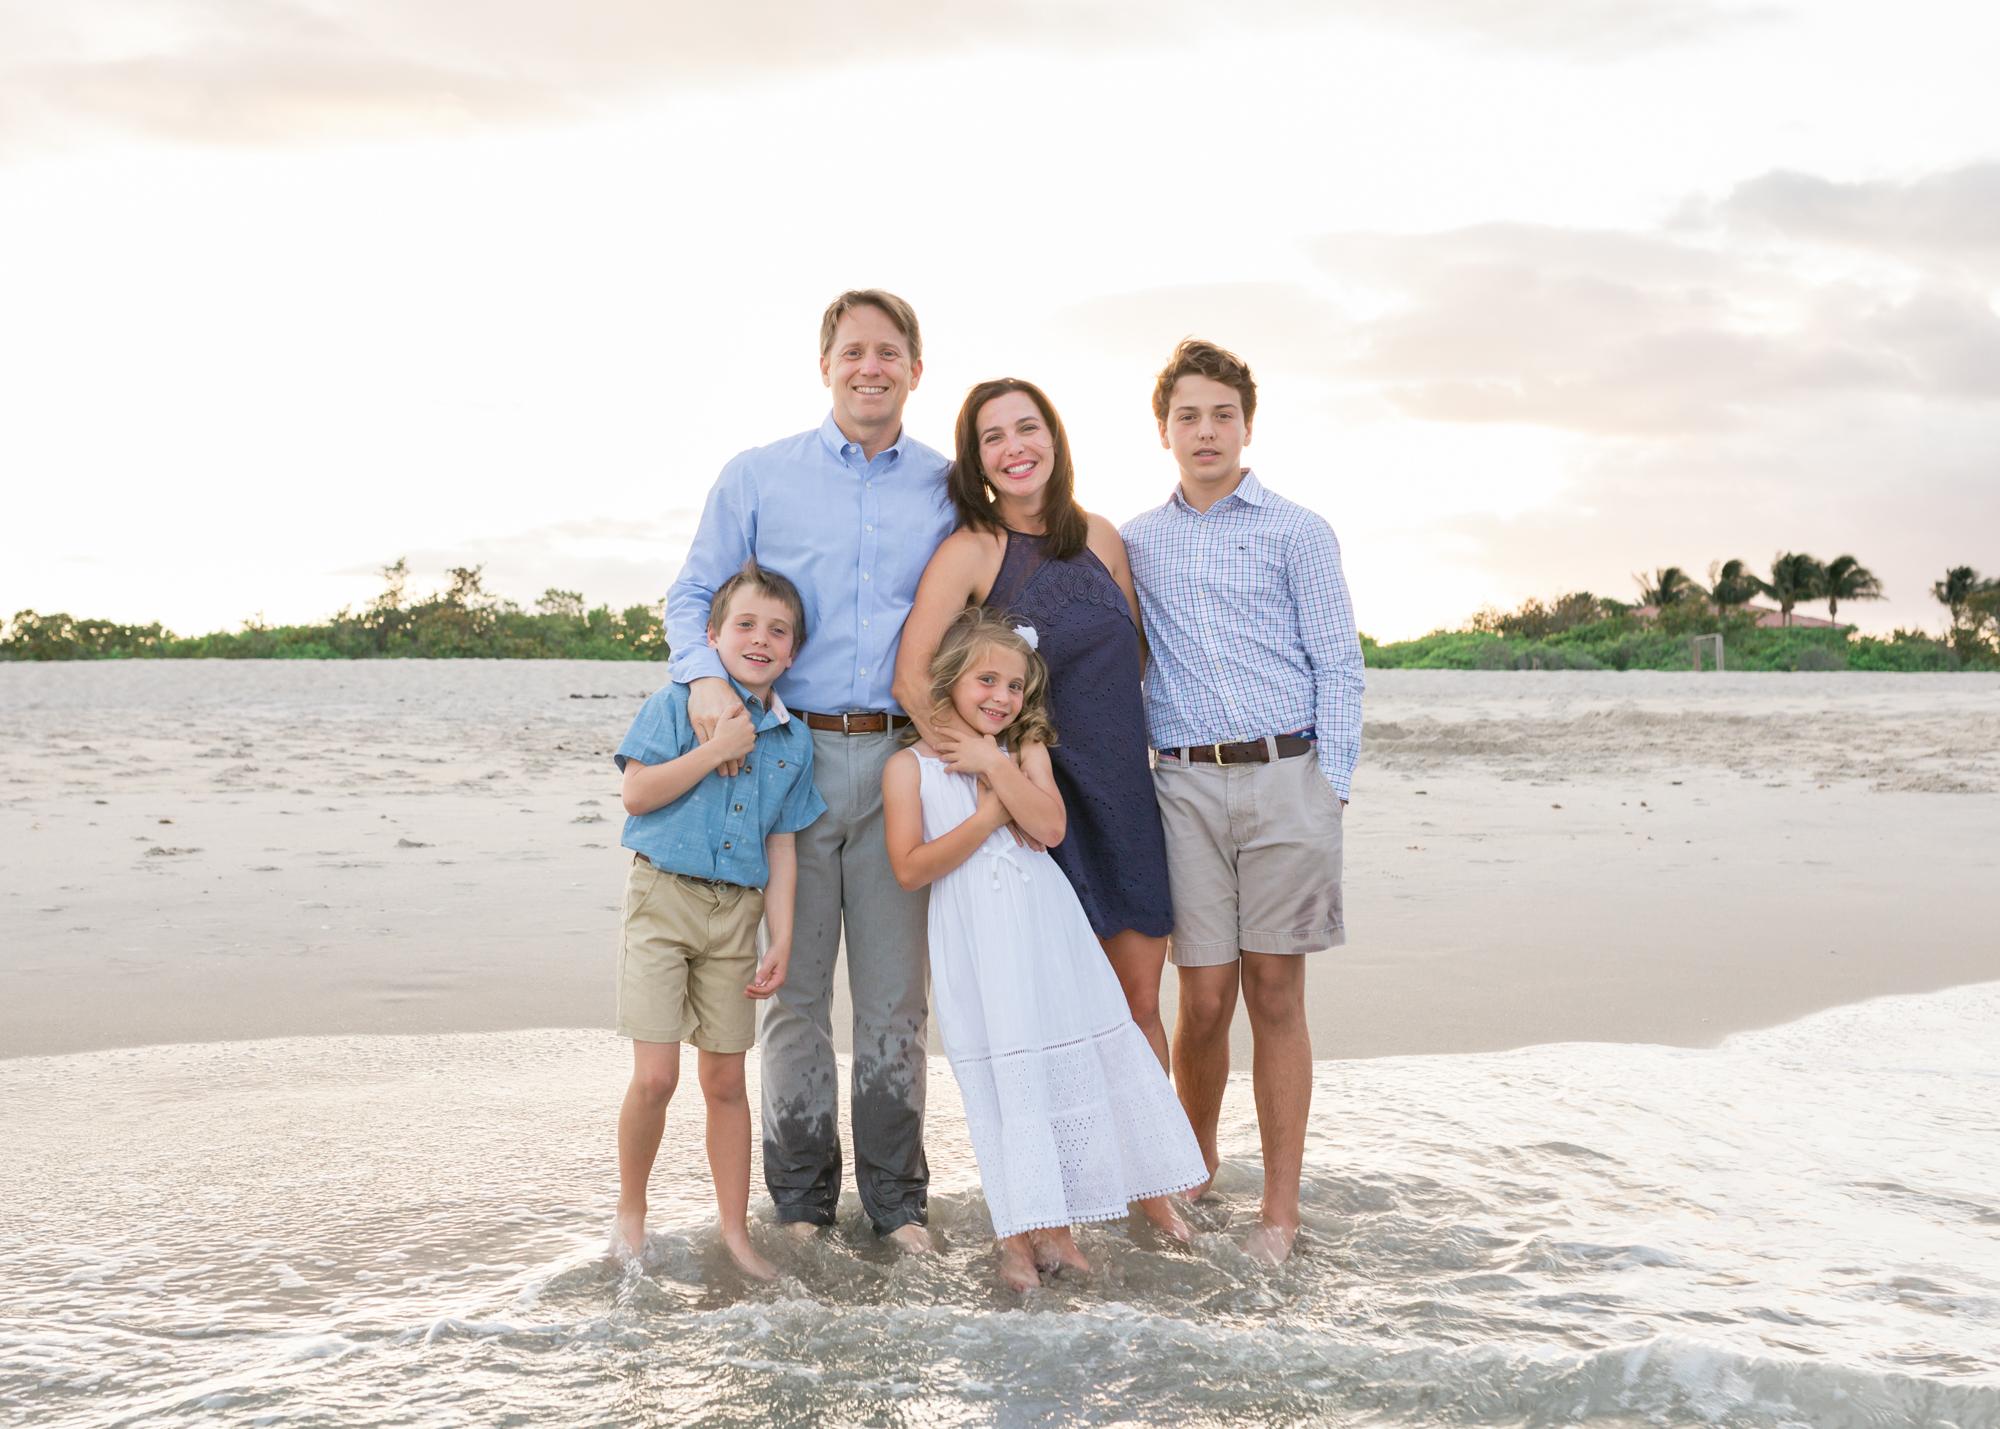 verobeachfamilyphotography.jpg